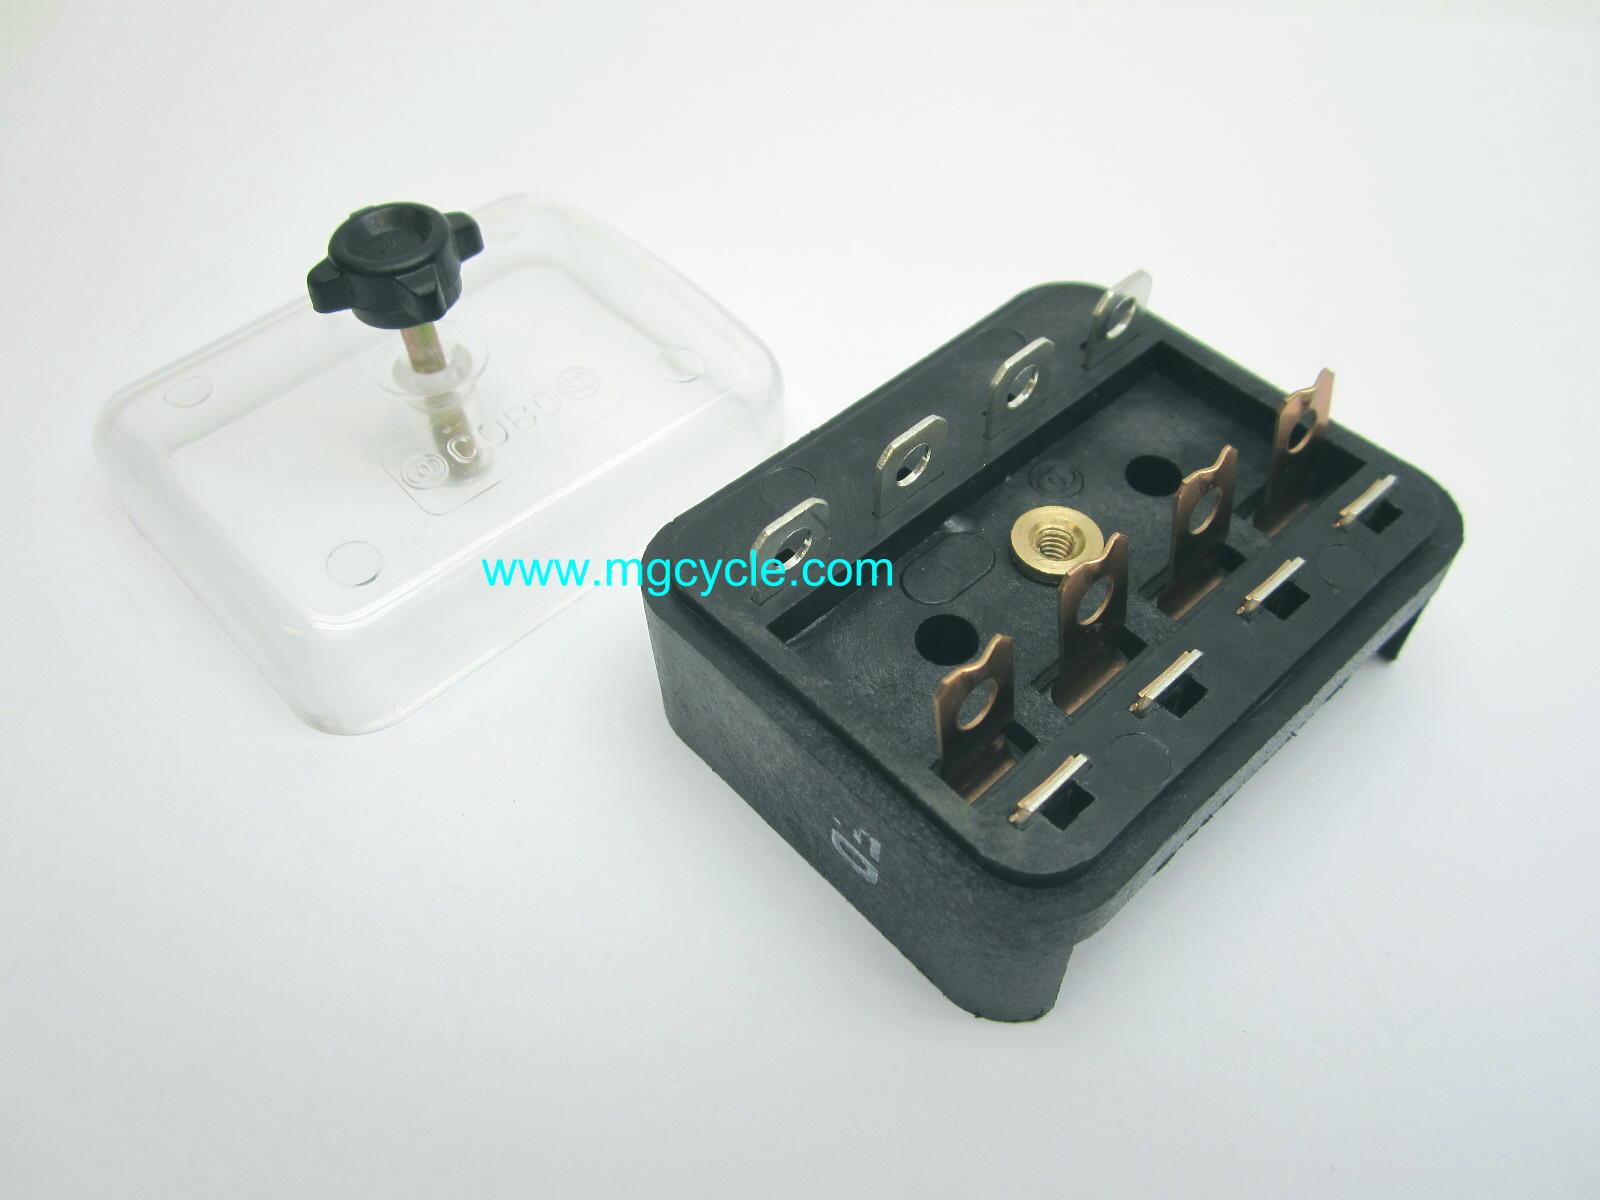 V35 Fuse Box Translation : Fuse box v ii monza mg